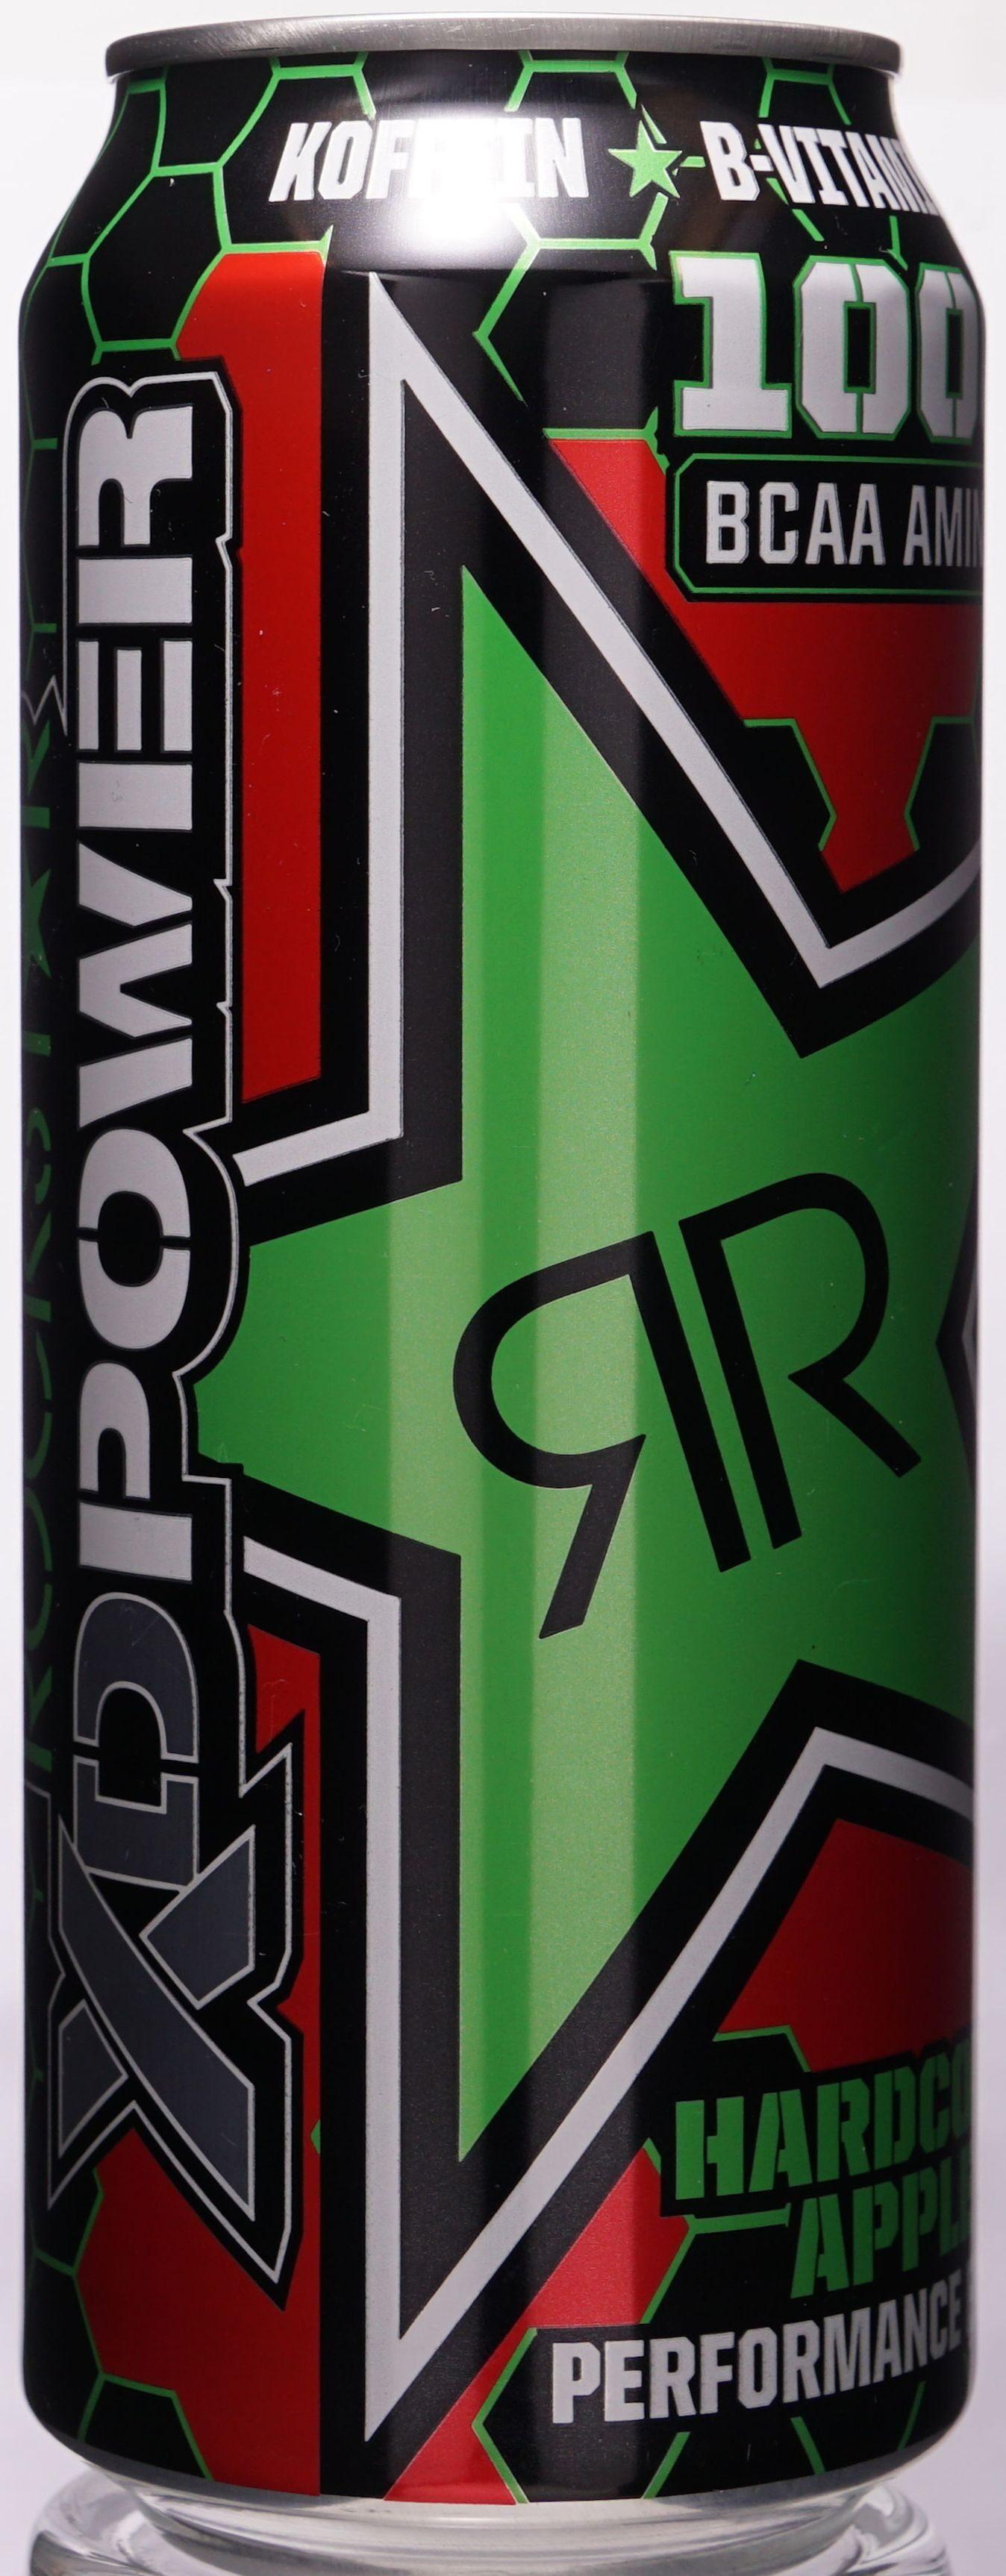 Rockstar Energie Hardcore Apple - Produkt - de